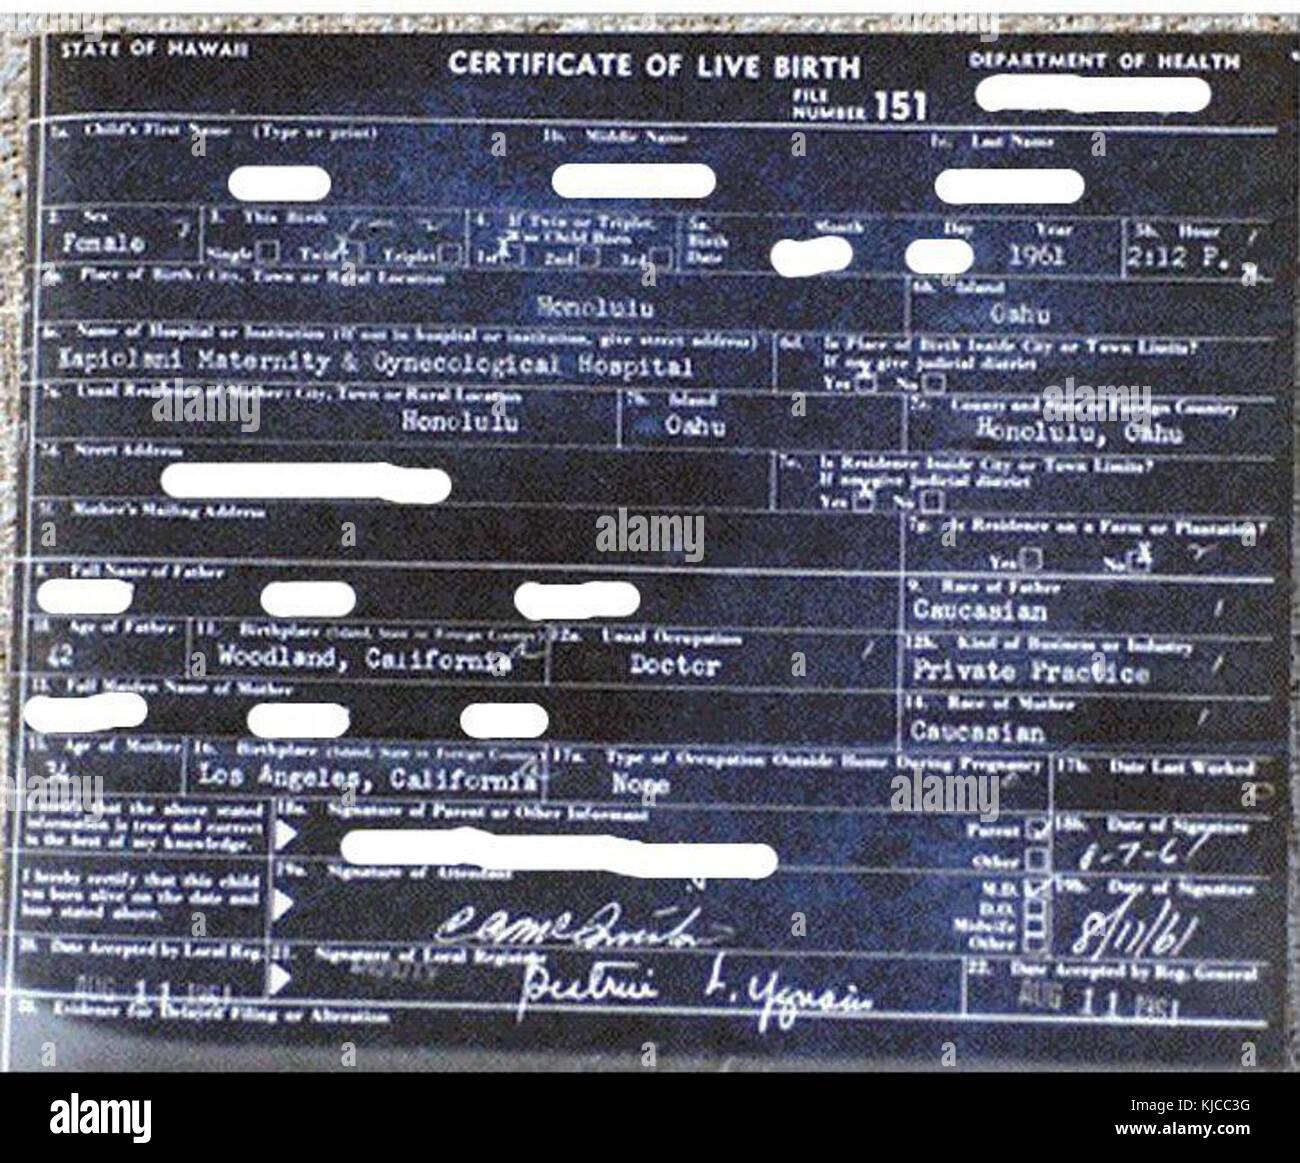 Certificate Of Birth Stockfotos & Certificate Of Birth Bilder ...